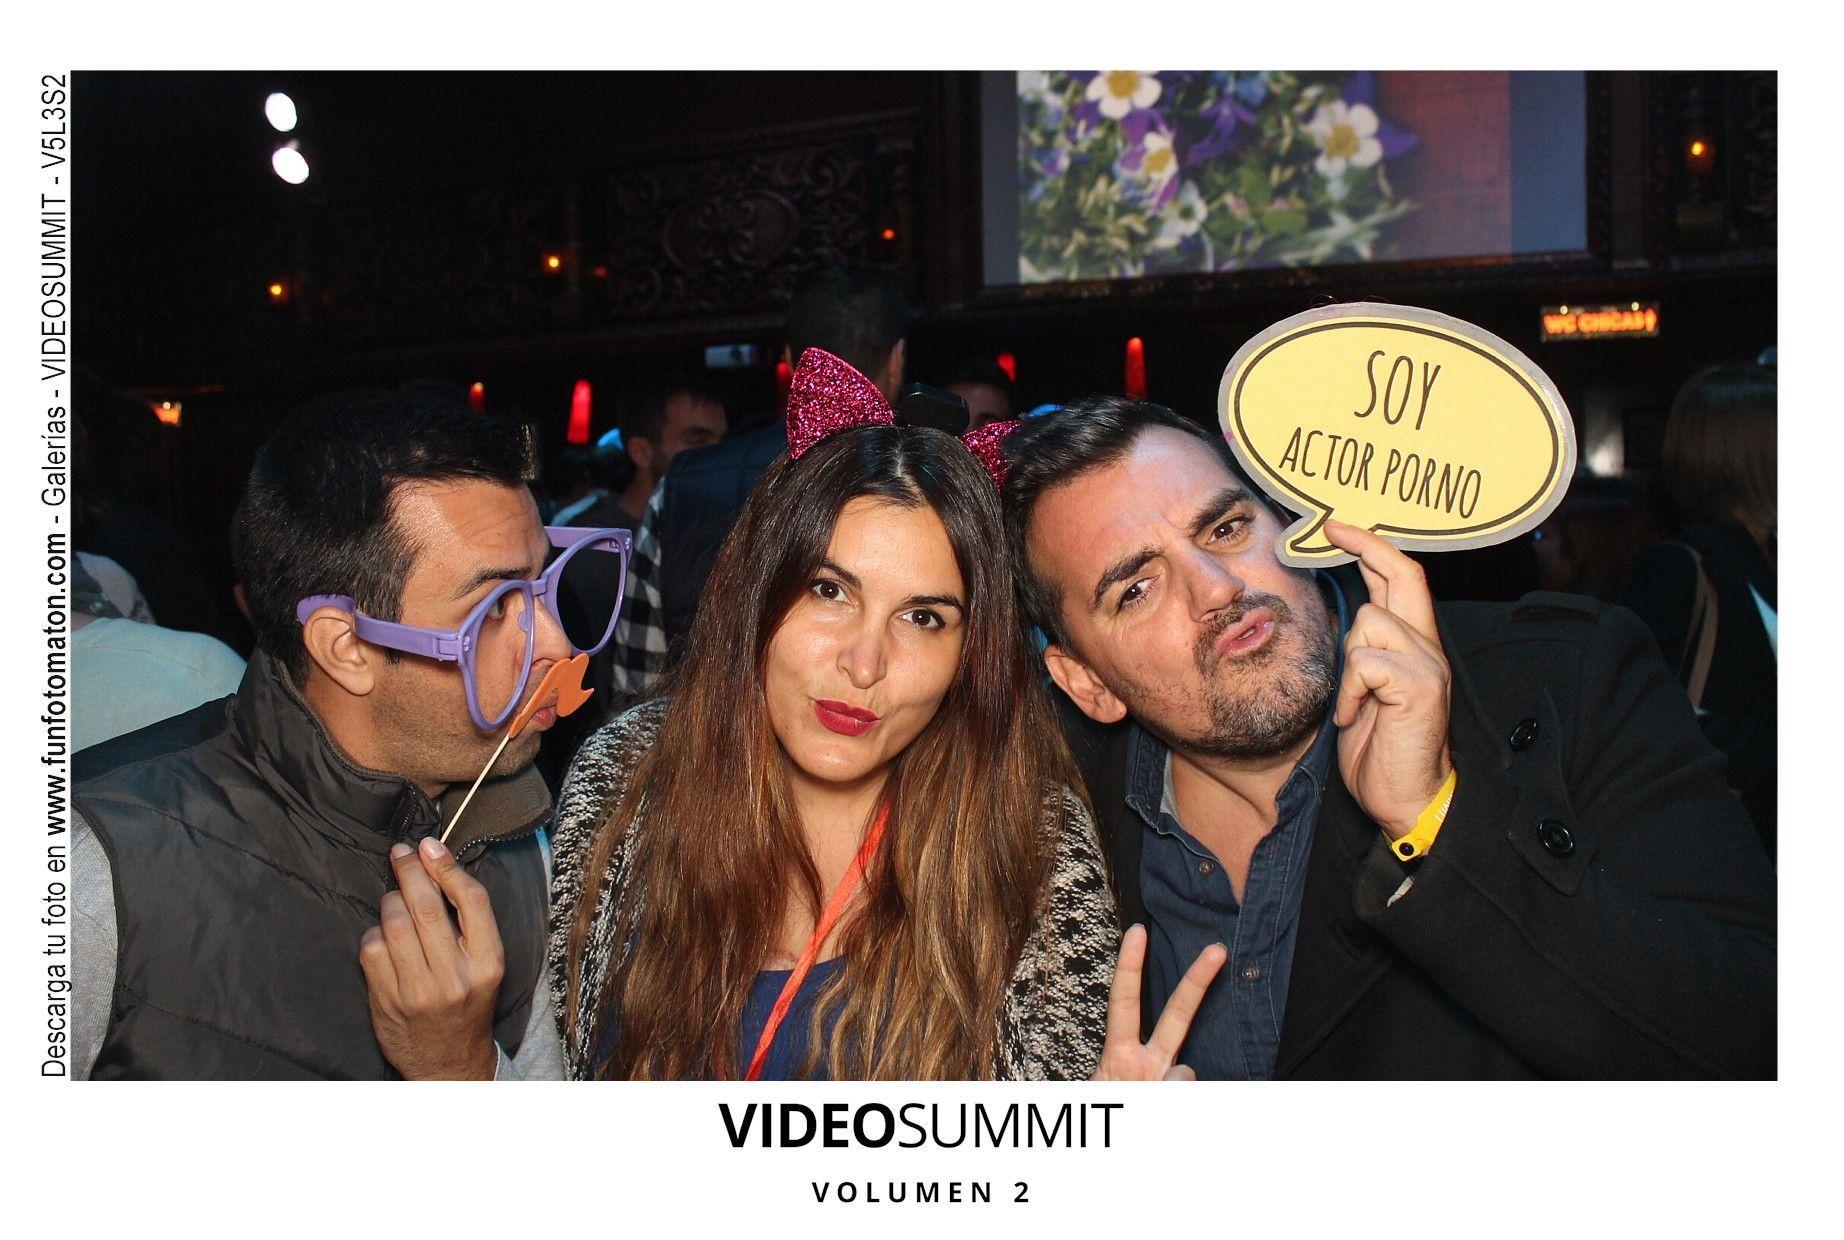 videosummit-vol2-club-party-039